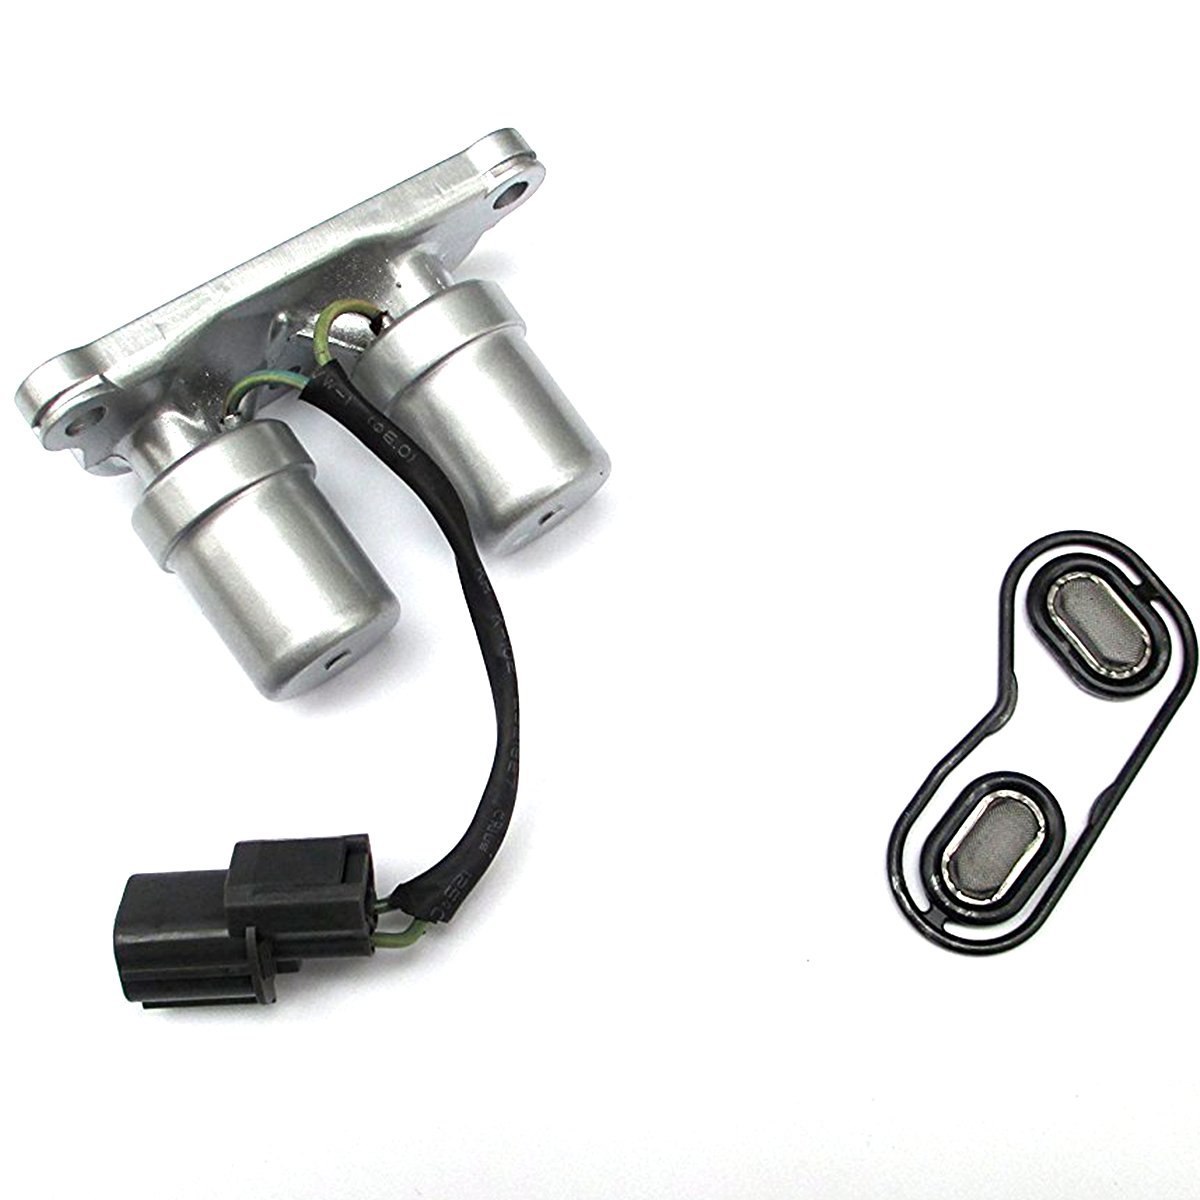 28200-P4R-003 Transmission Lock up Solenoid For Honda Civic 1994 1995 1996 1997 1998 1999 2000 28200P4R003